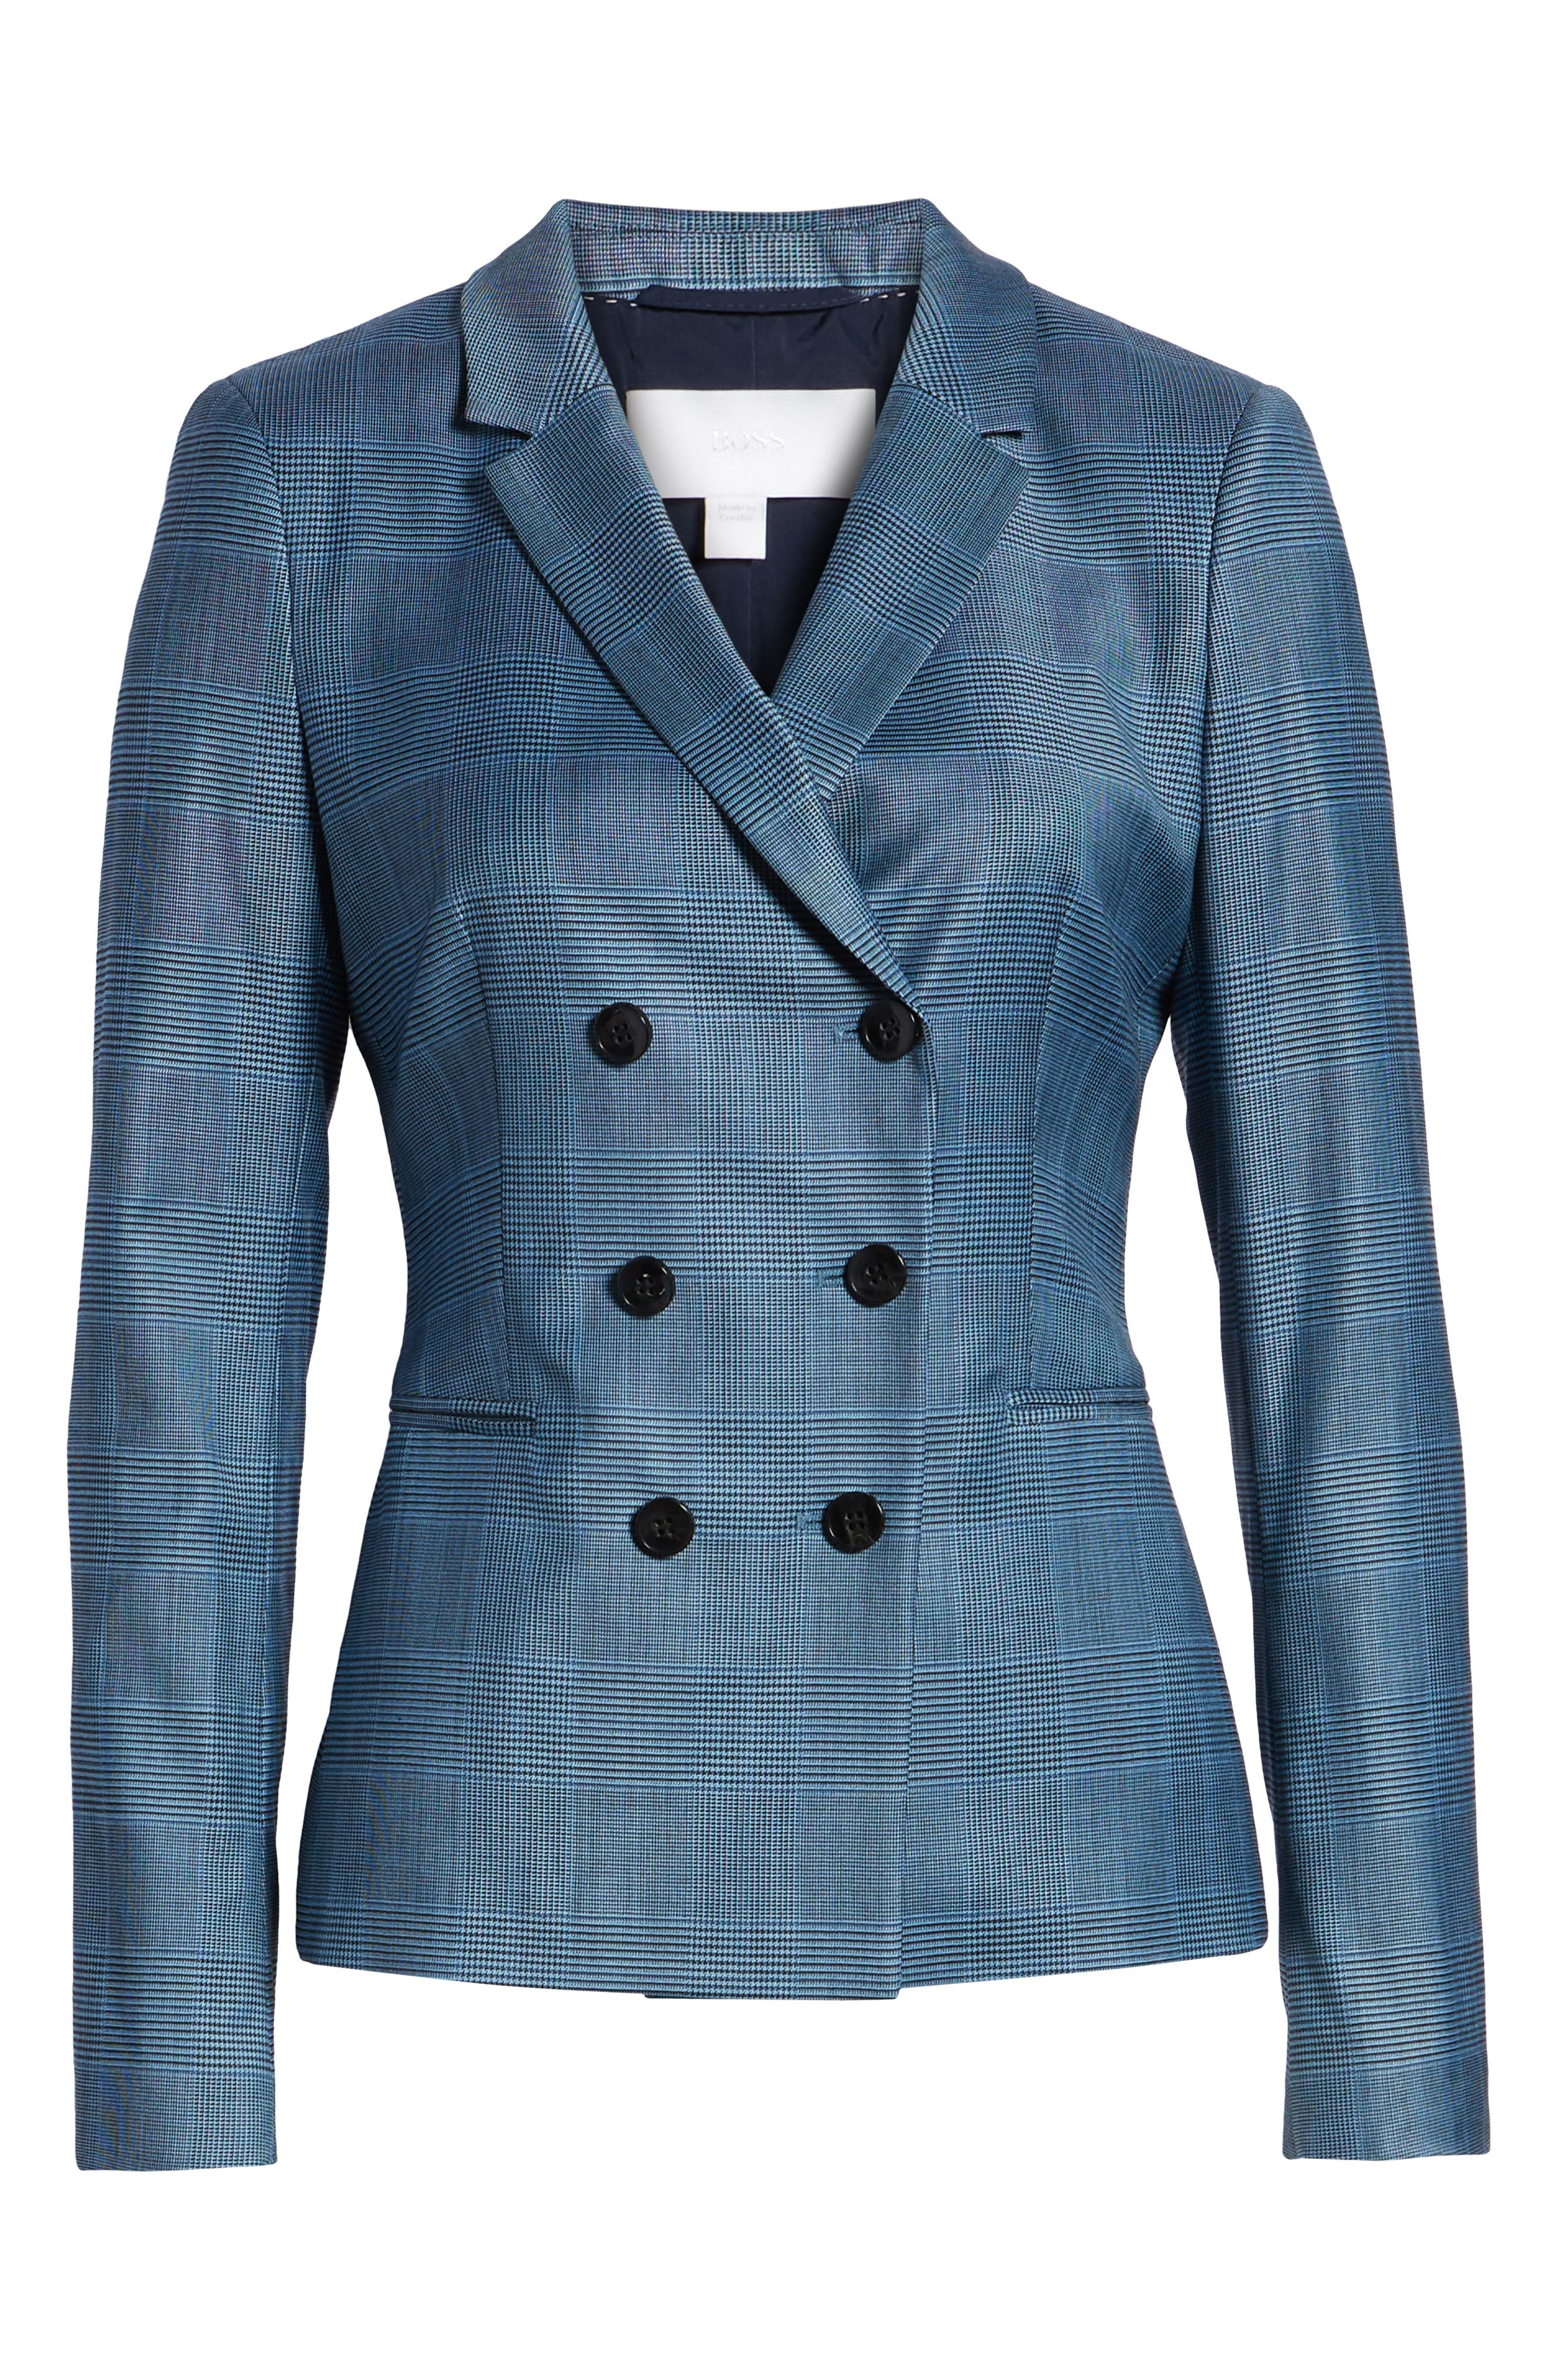 Jelaya Glencheck Double Breasted Suit Jacket,                             Alternate thumbnail 5, color,                             467